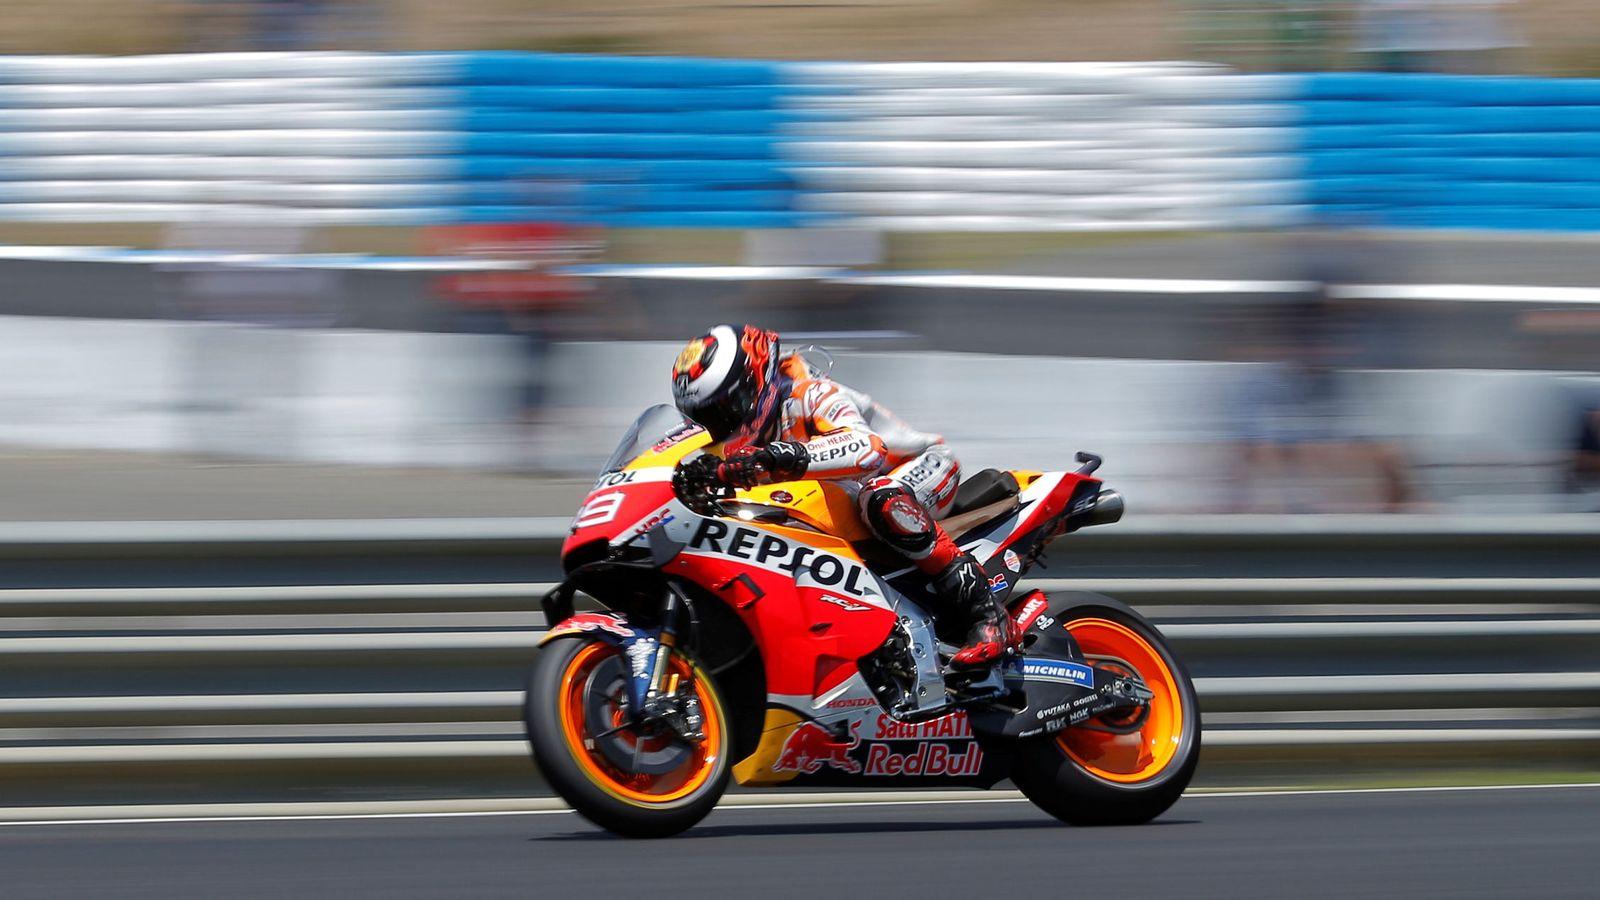 Foto: Jorge Lorenzo, rodando solo durante la carrera de este domingo en Jerez. (Reuters)